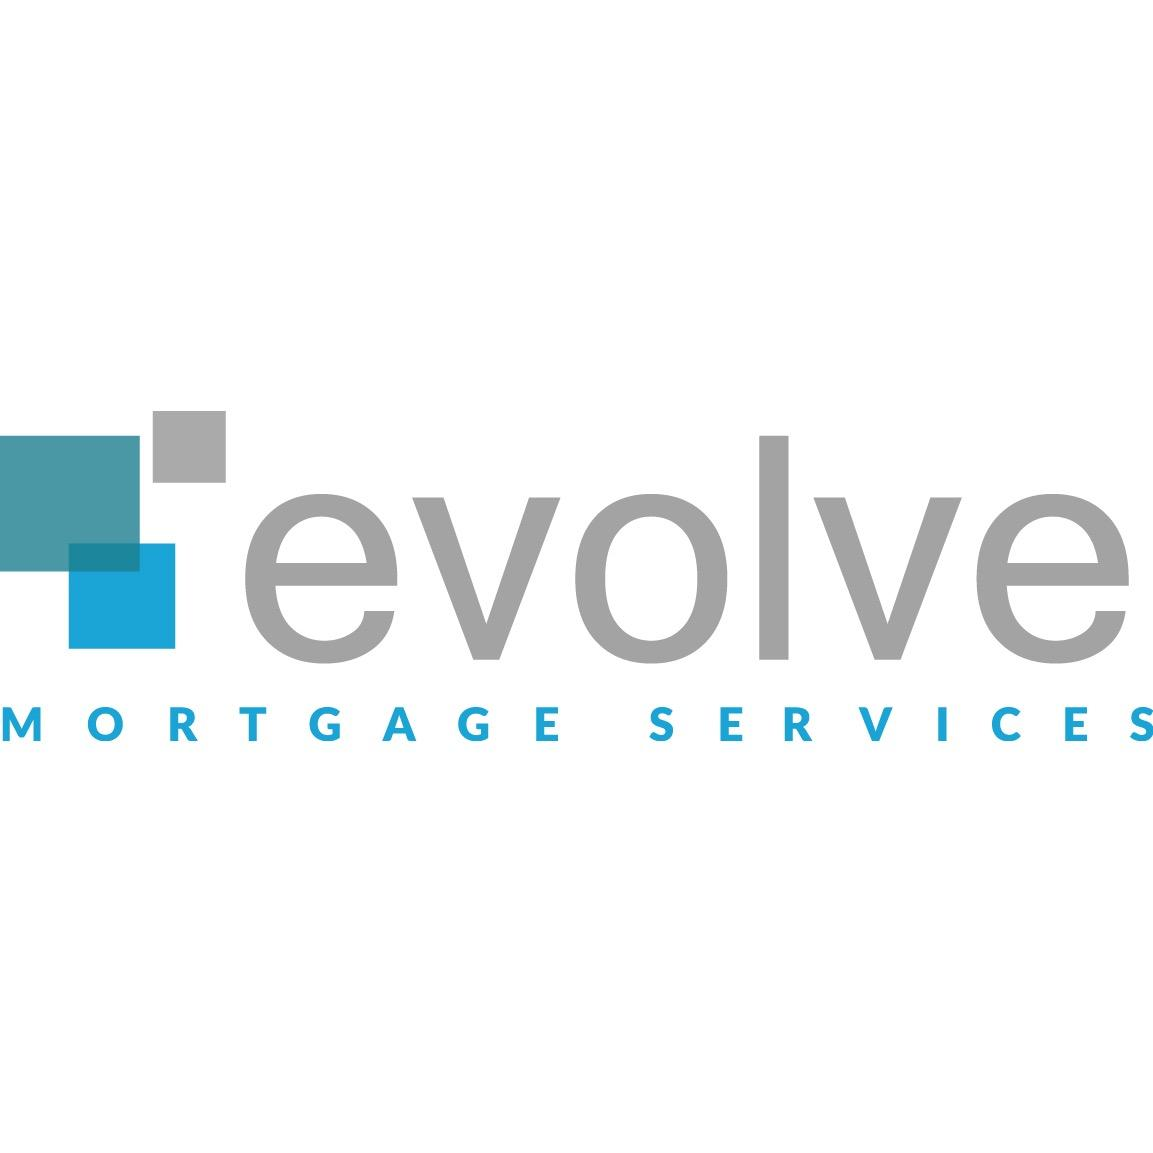 Evolve Mortgage Services